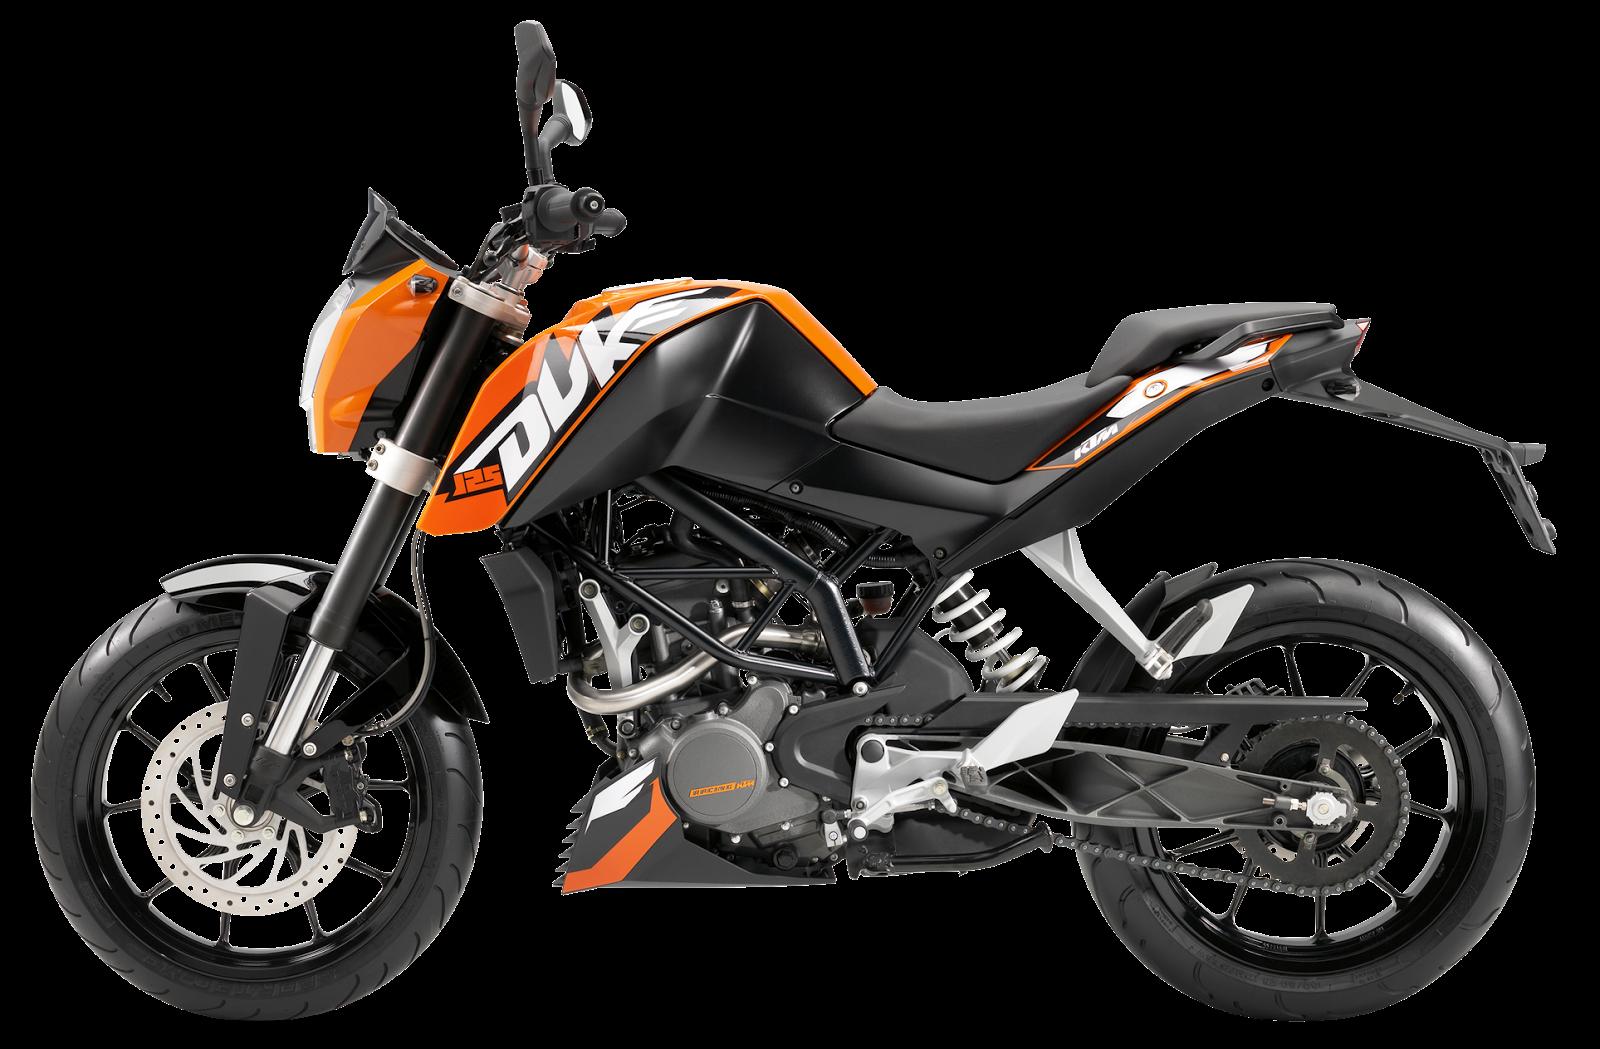 Motorcycle clipart cruiser motorcycle. Ktm duke car asia